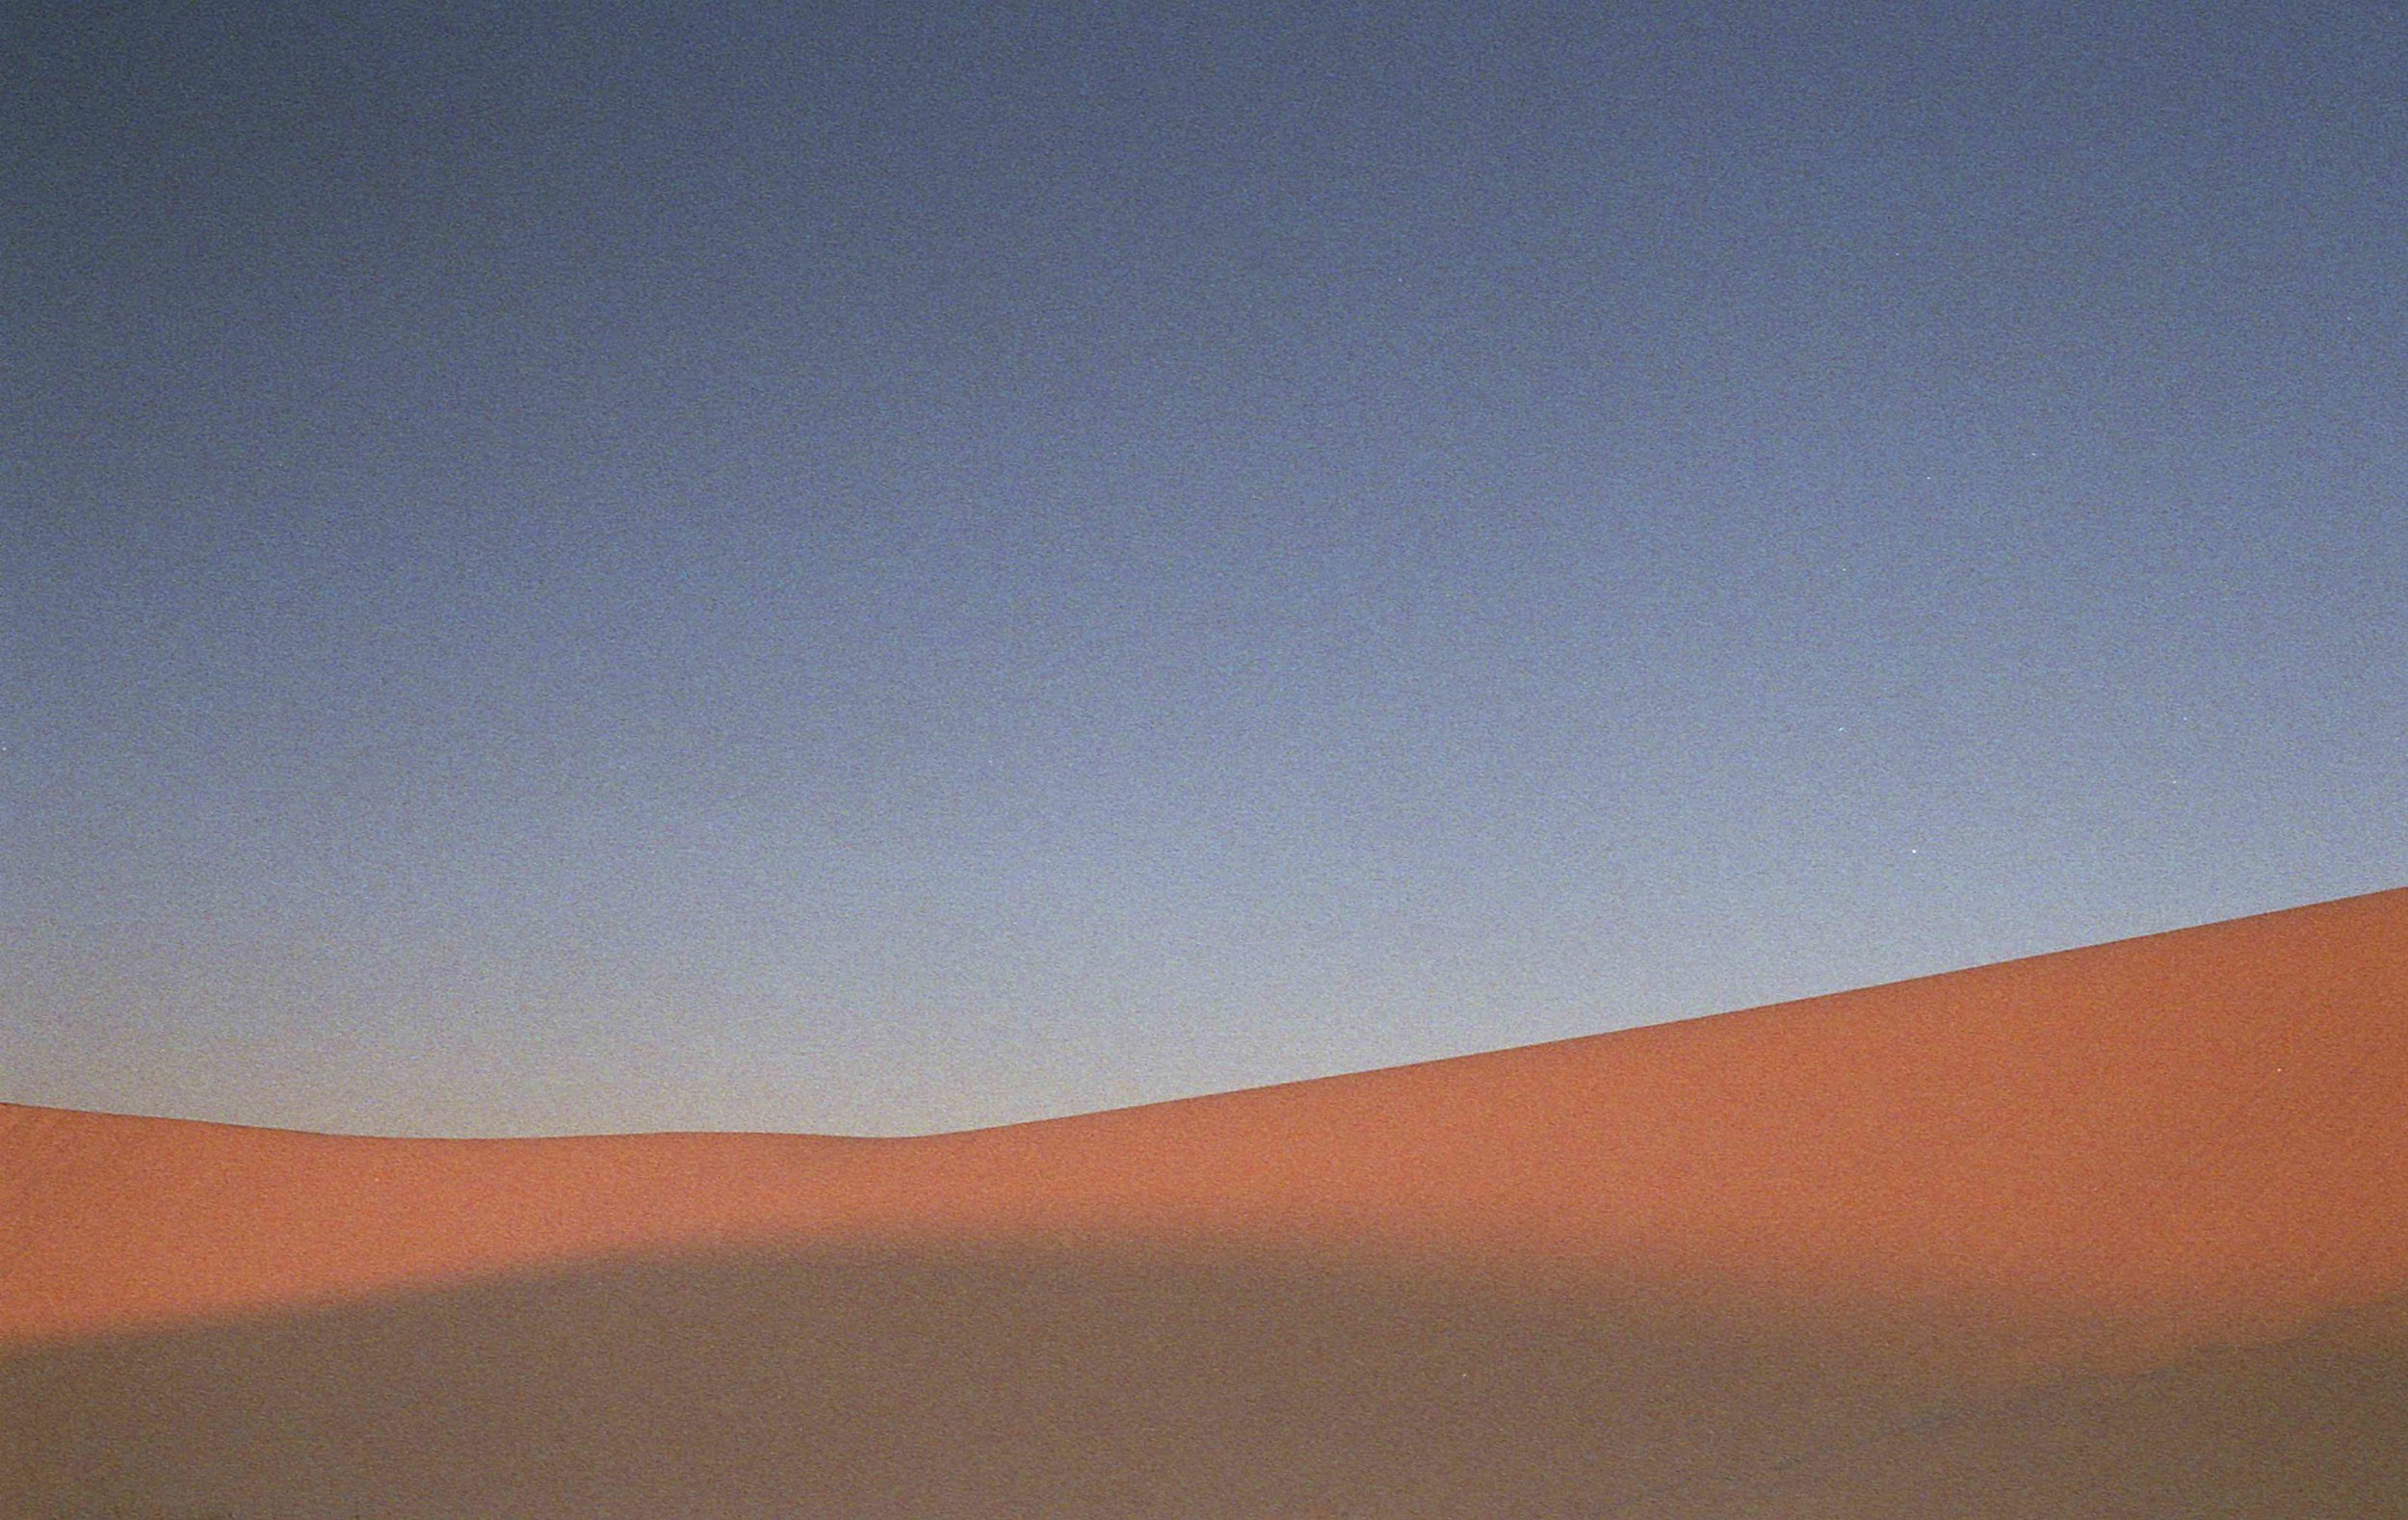 Desert237.jpeg